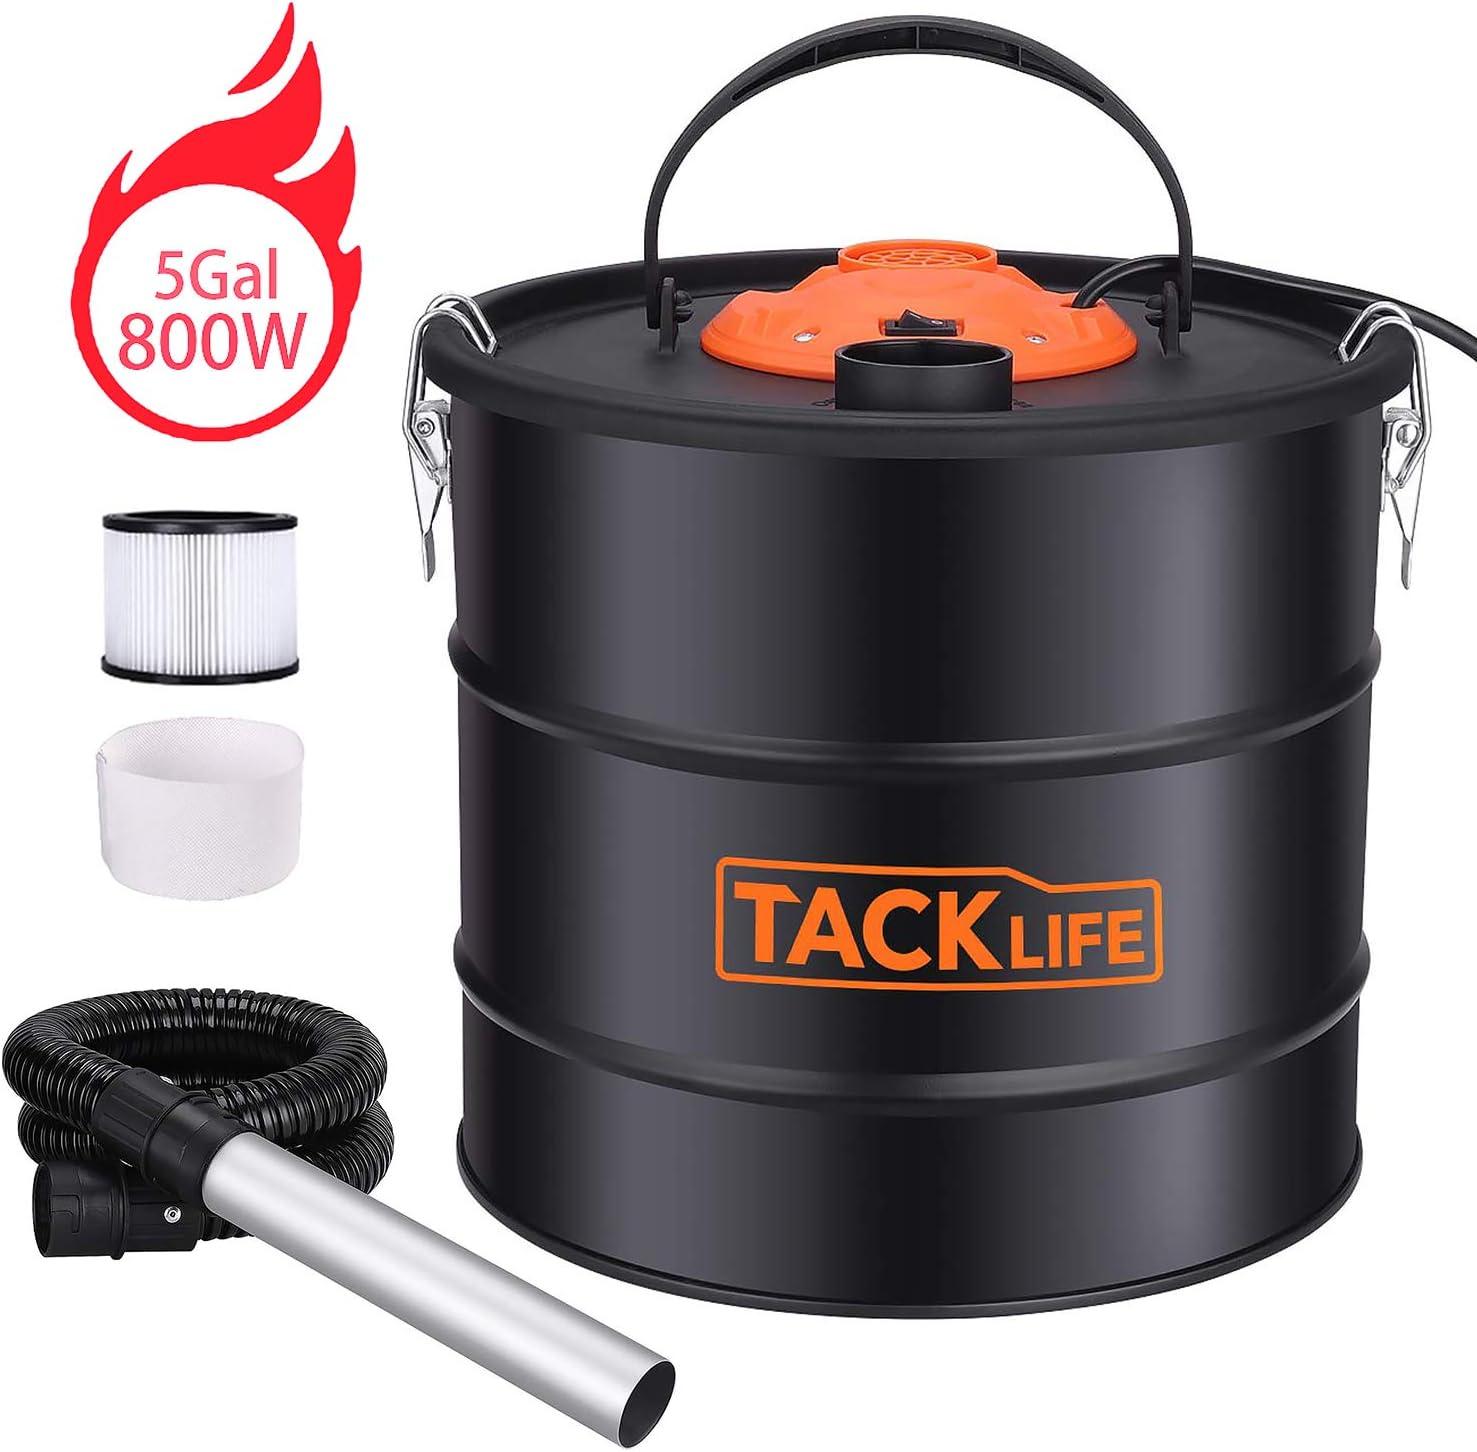 Ash Vacuum Cleaner TACKLIFE, 800W 120V 5Gal 3.3 ft Hose+7.9in Tube, Debris/Ash Collector PVC03A